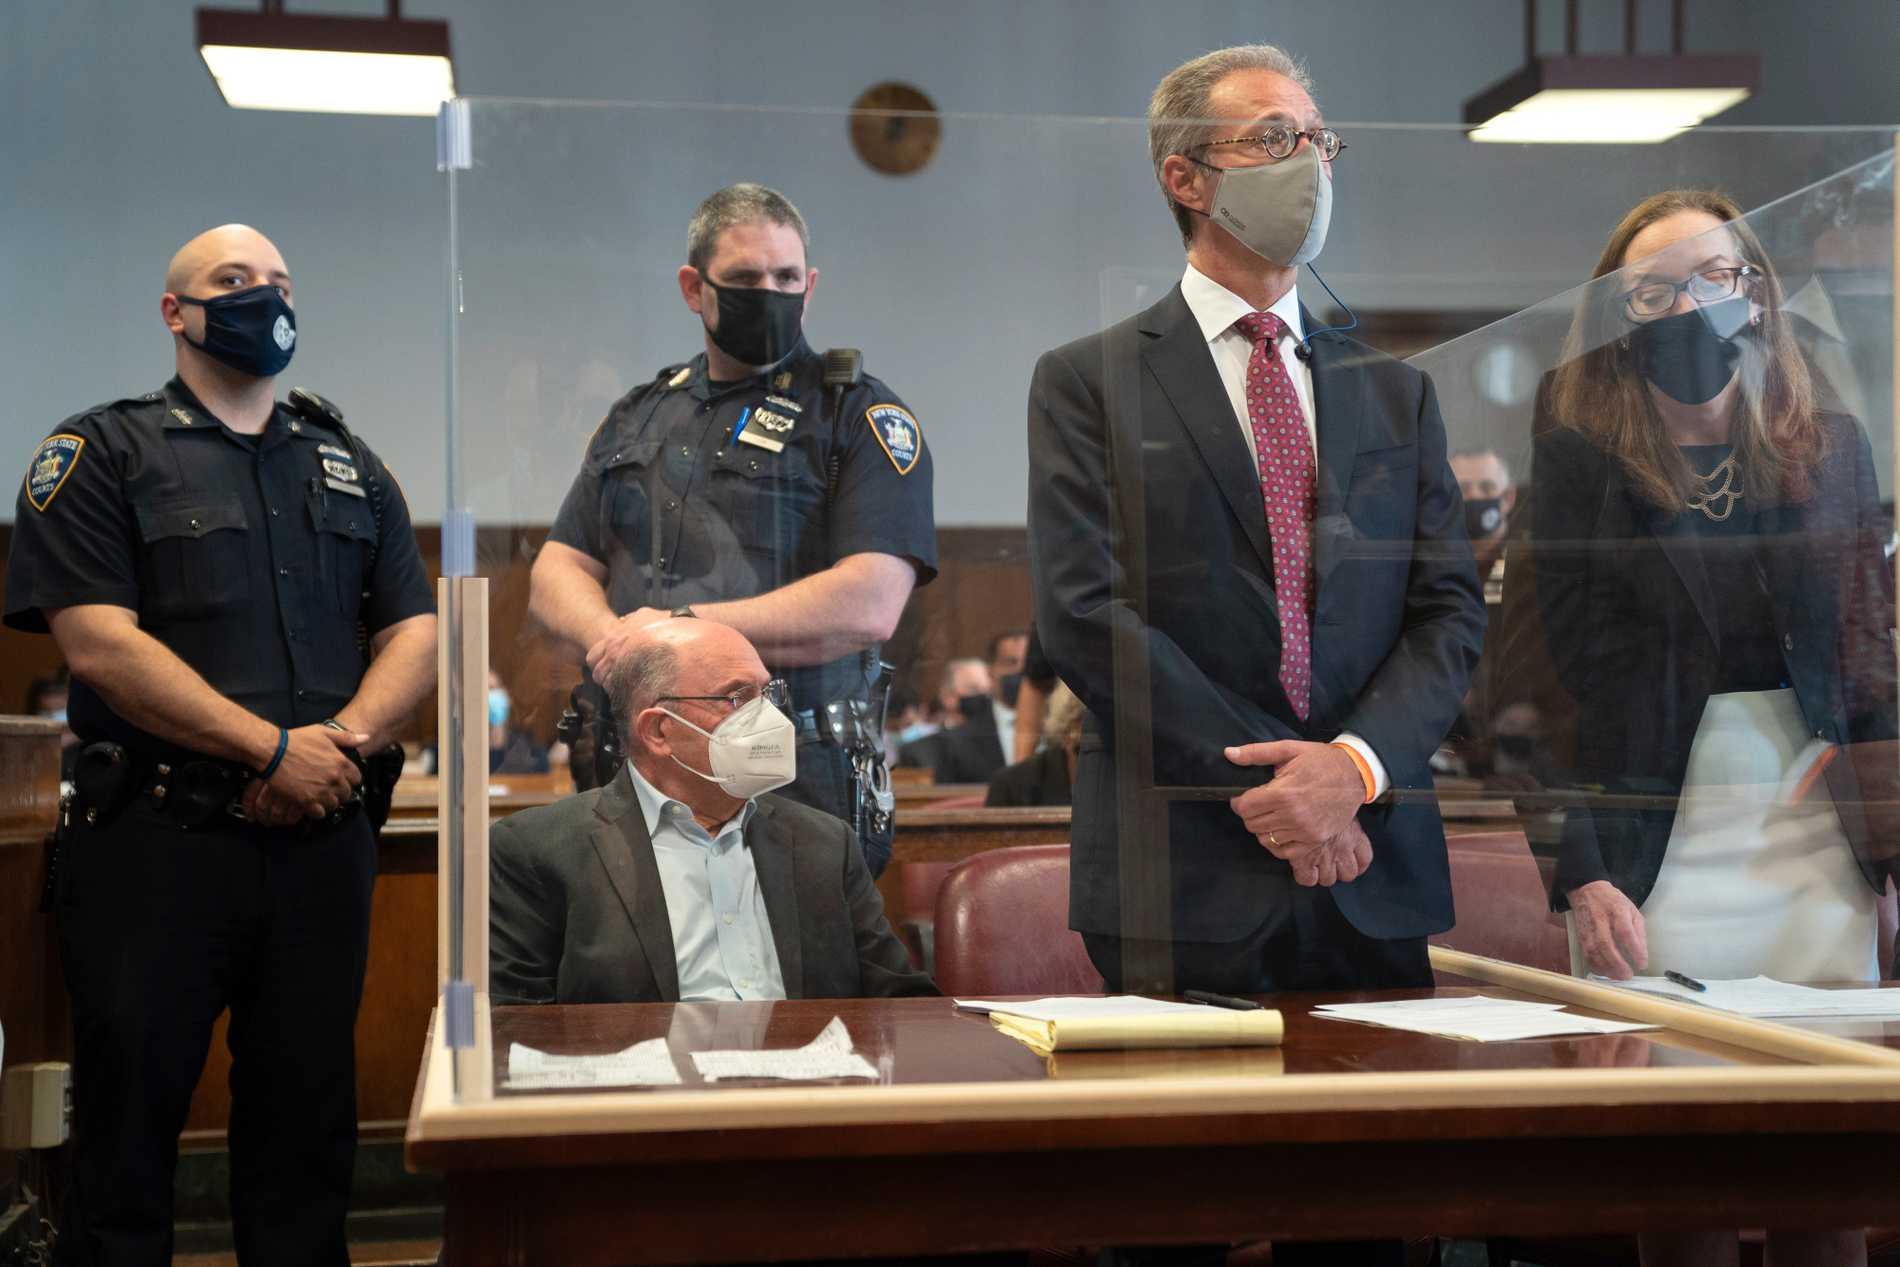 Allen Weisselberg sitting in the courtroom.